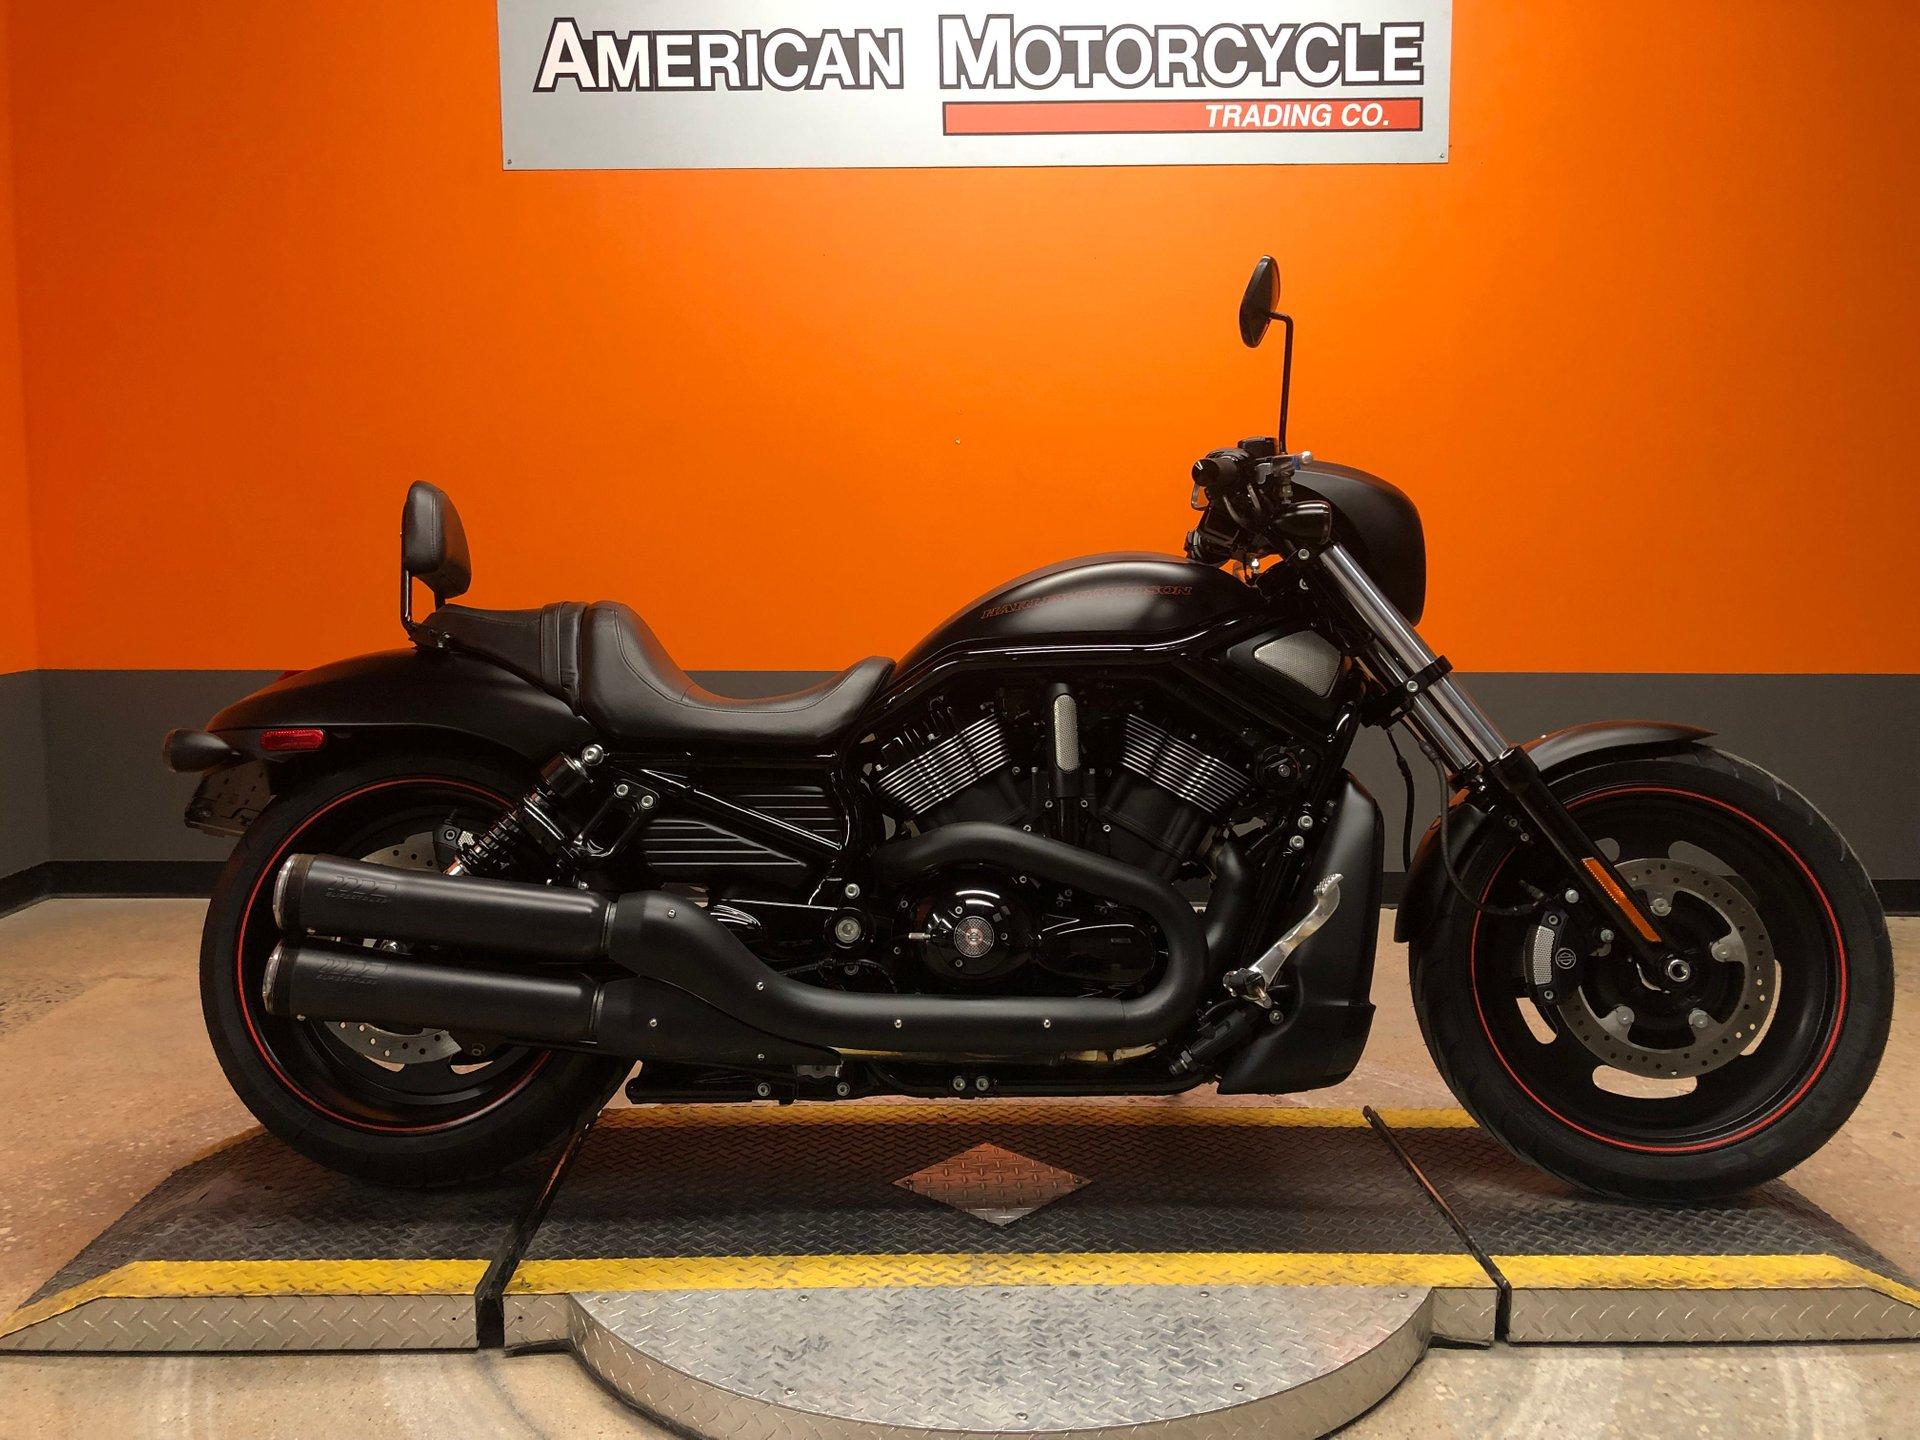 2008 Harley Davidson V Rod American Motorcycle Trading Company Used Harley Davidson Motorcycles